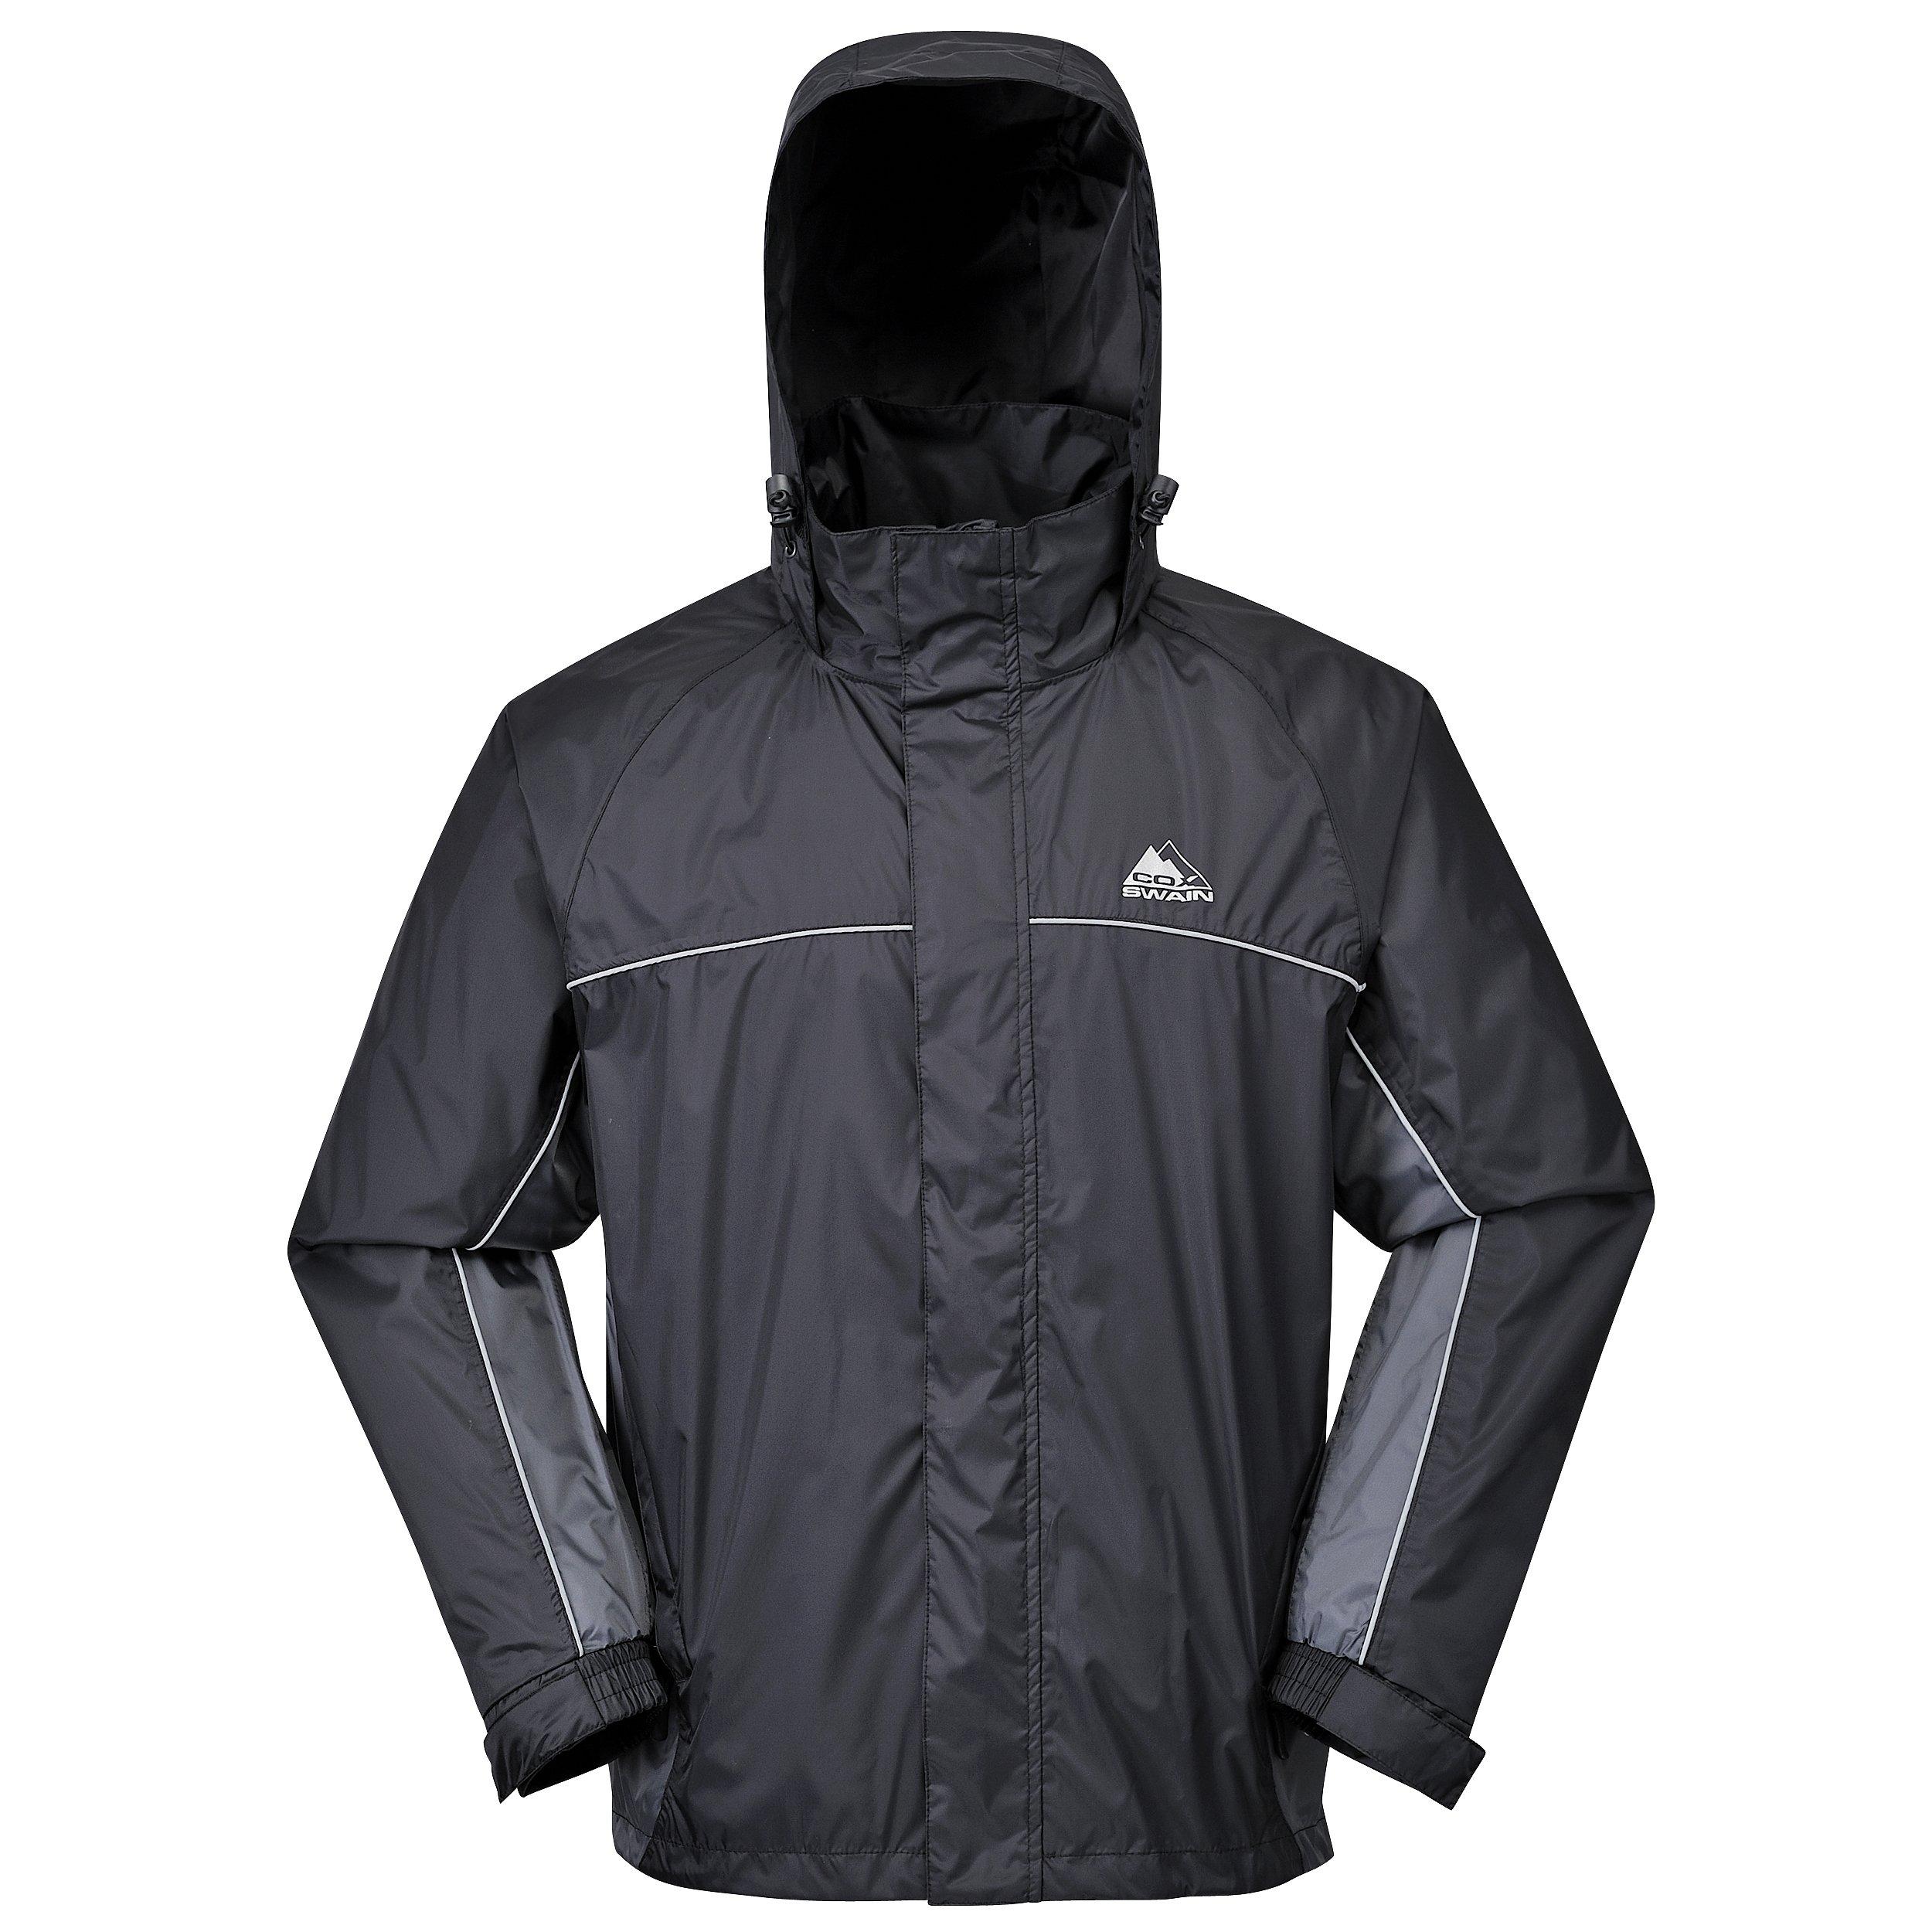 Sonstige Bekleidung Freundschaftlich Regen Jacke Hose Anzug Regenschutz Regenanzug Regenjacke Regenhose Kapuze